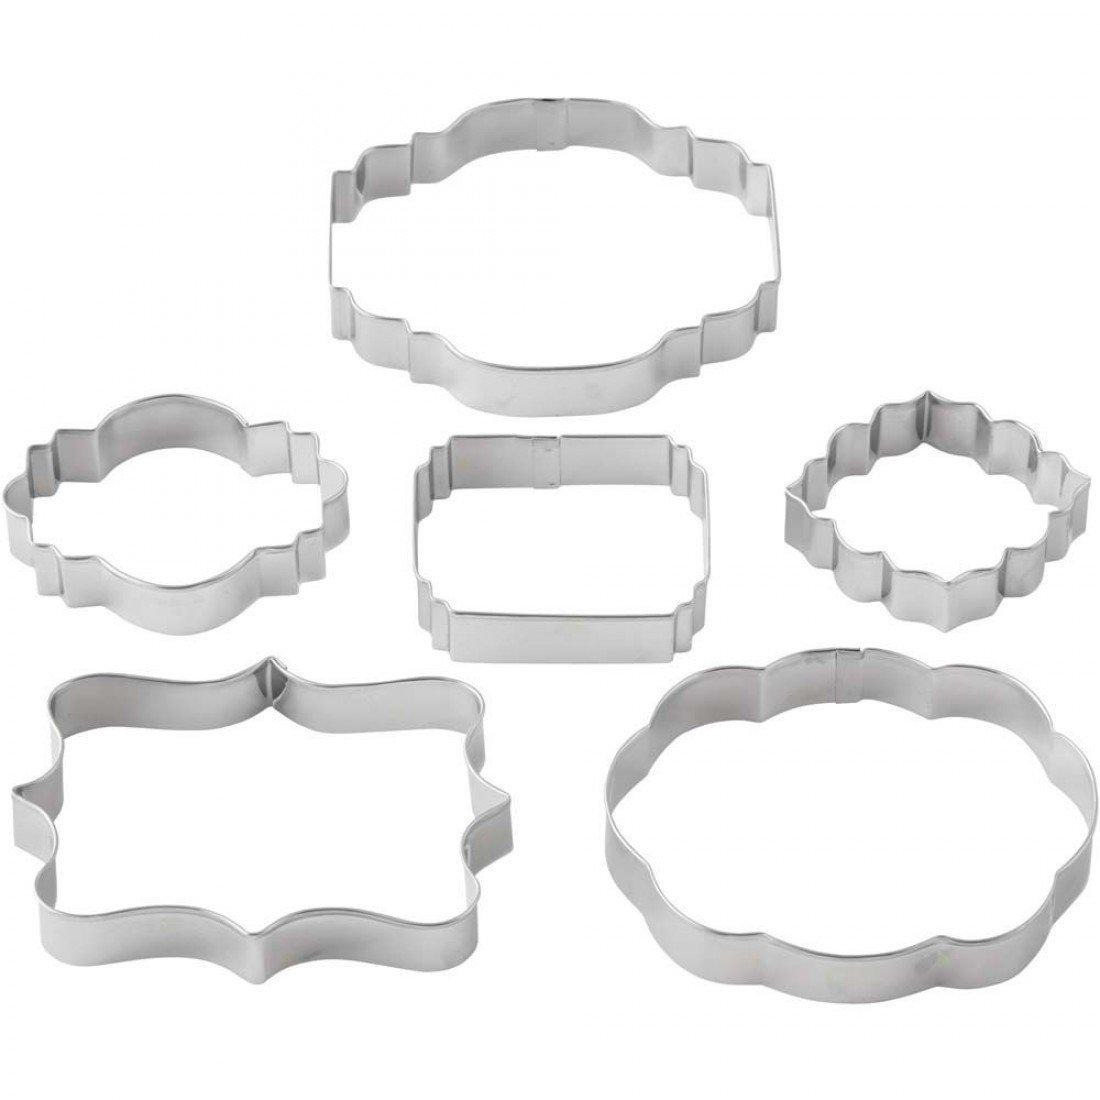 Wilton Cookie Cutter Set of 6 -GEOMETRIC FRAME/PLAQUE -Γεωμετρικά κουπάτ Κορνίζες/πλάκες 6τμχ